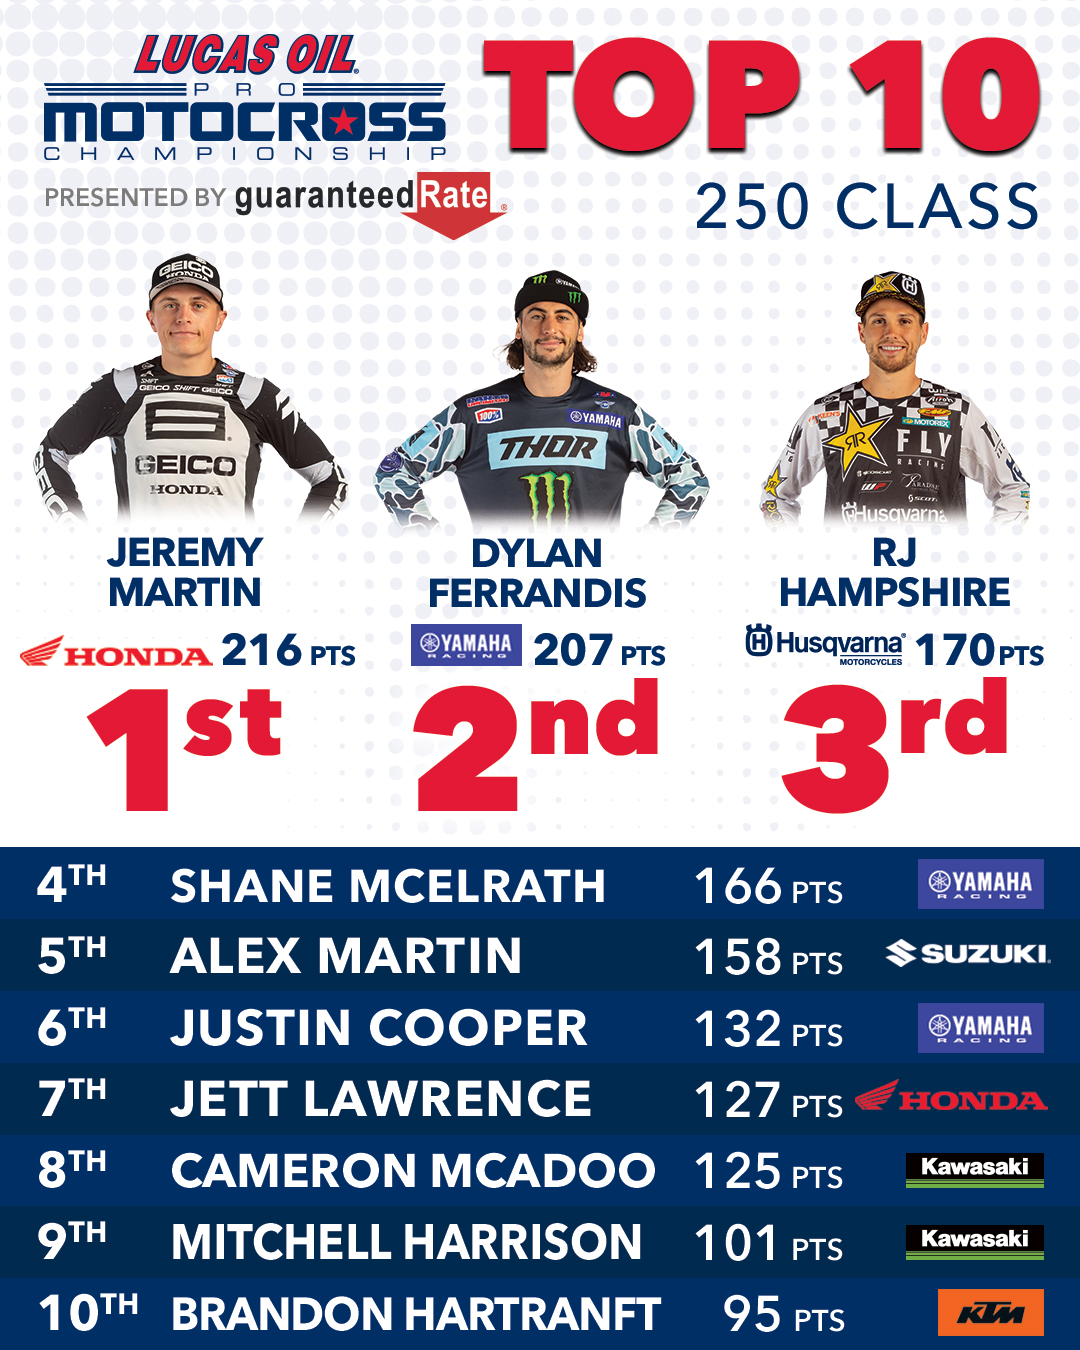 200911 Lucas Oil Pro Motocross - Top 10 250 Class